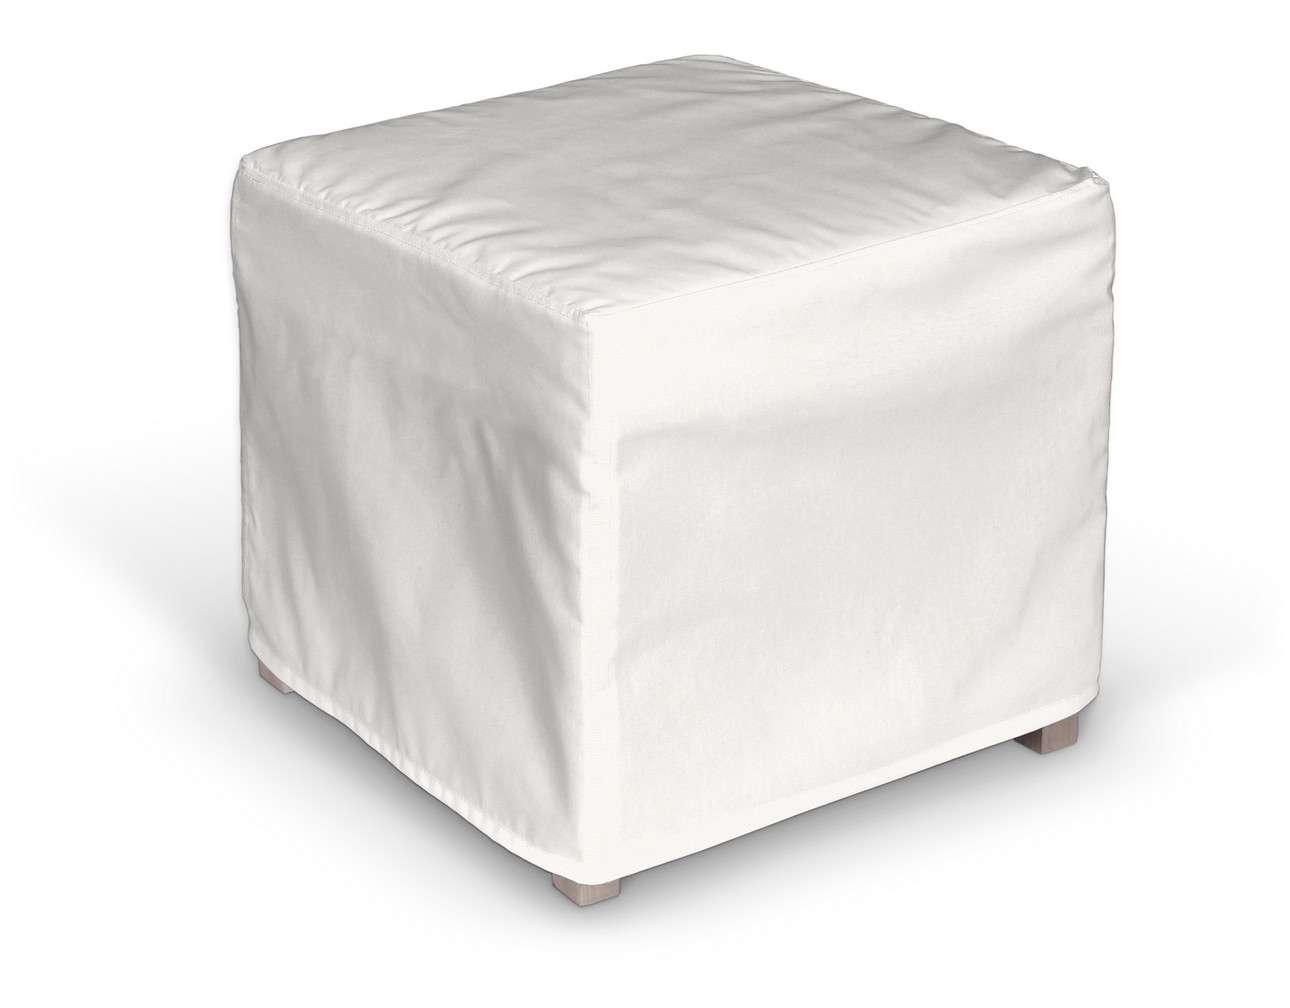 Solsta Pällbo Bezug Solsta Pällbo von der Kollektion Cotton Panama, Stoff: 702-34